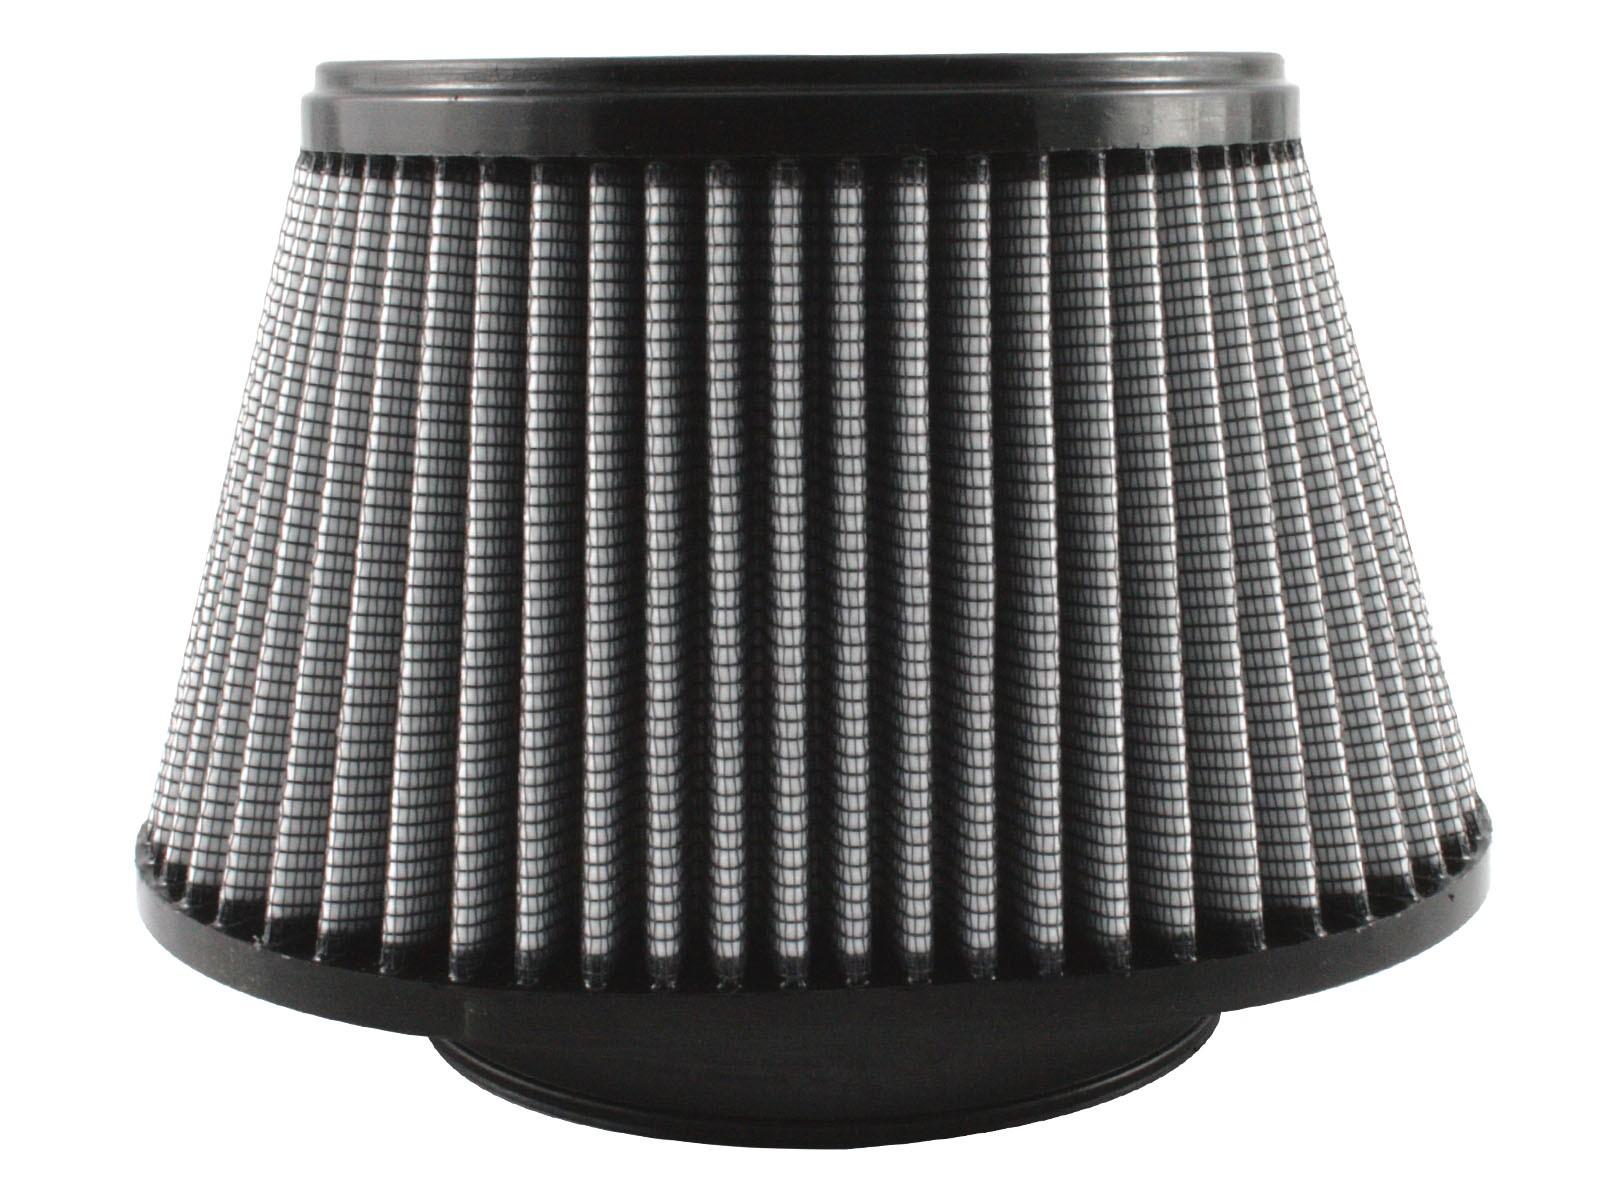 aFe POWER 21-90053 Magnum FLOW Pro DRY S Air Filter